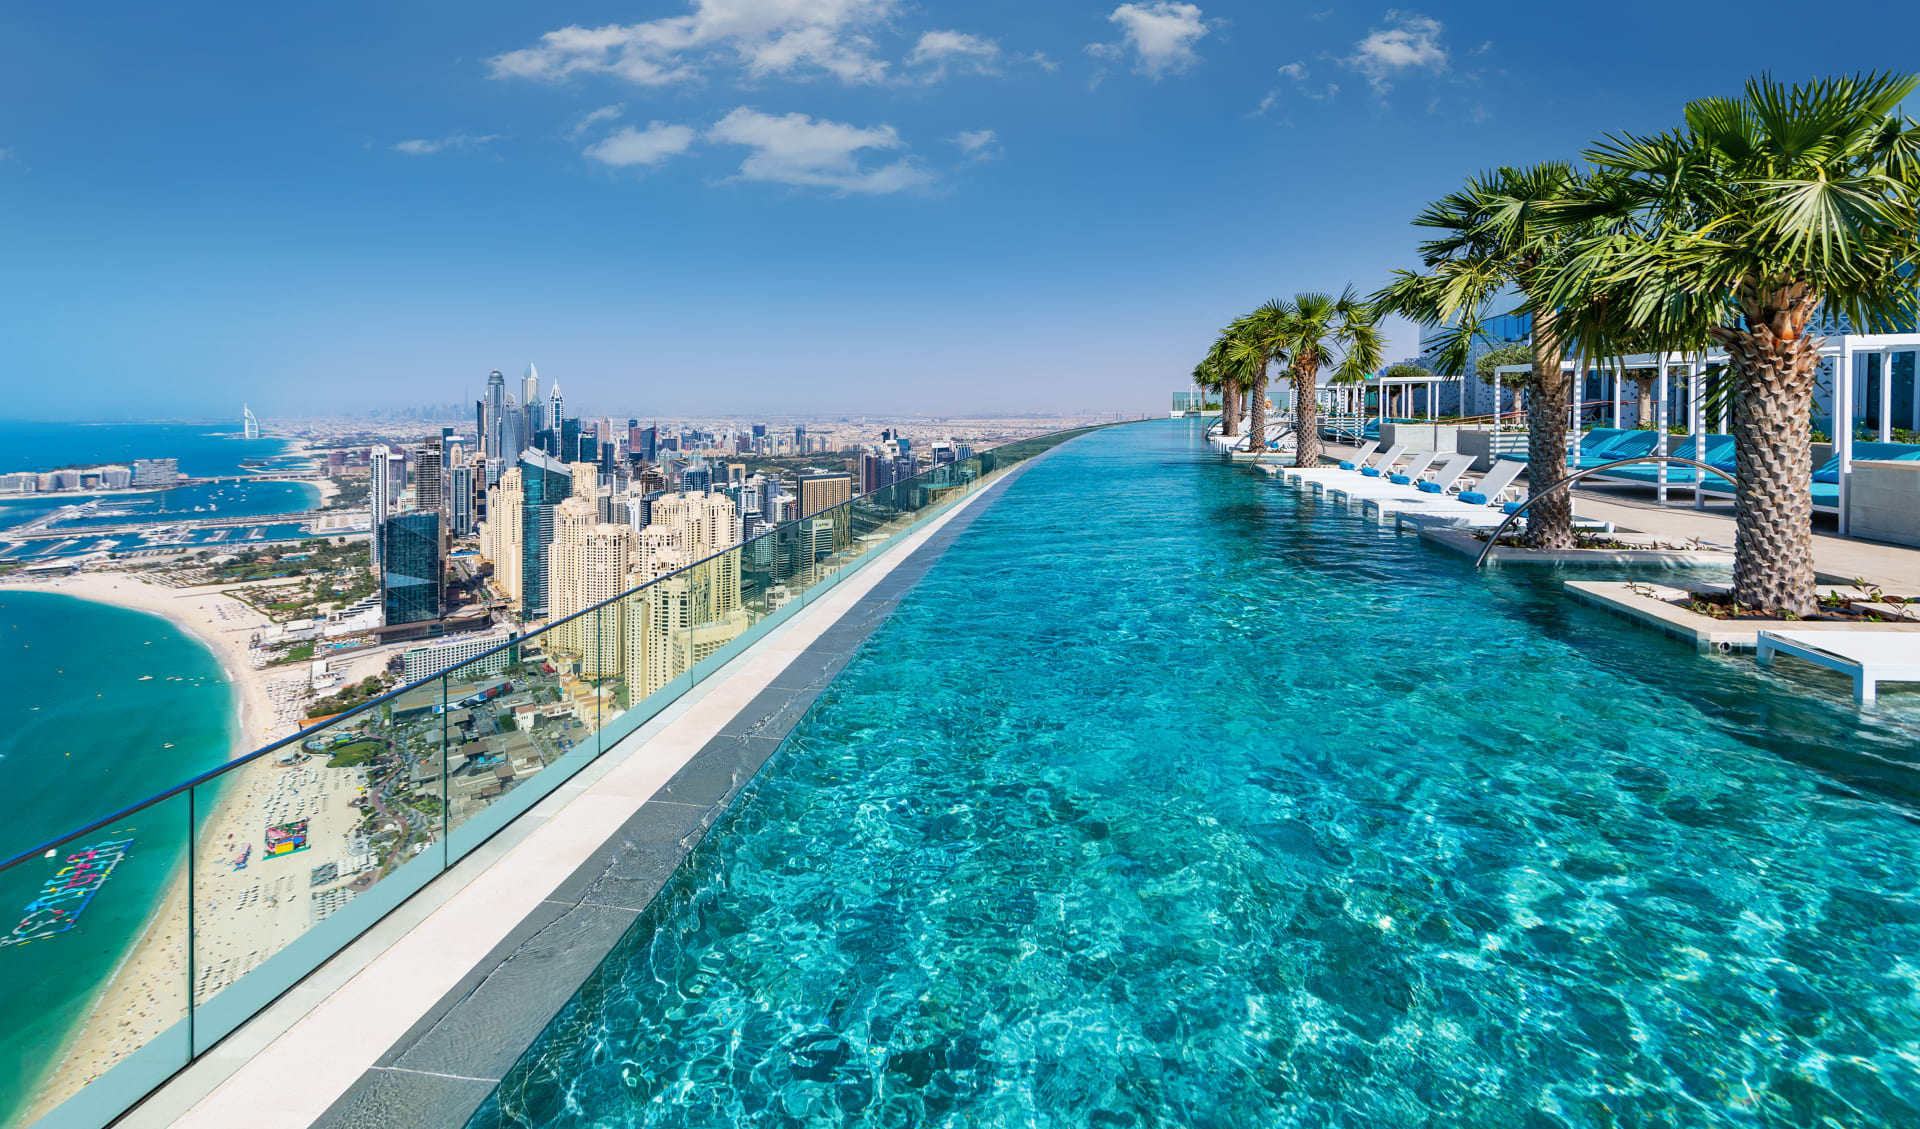 Address Beach Resort in Dubai: